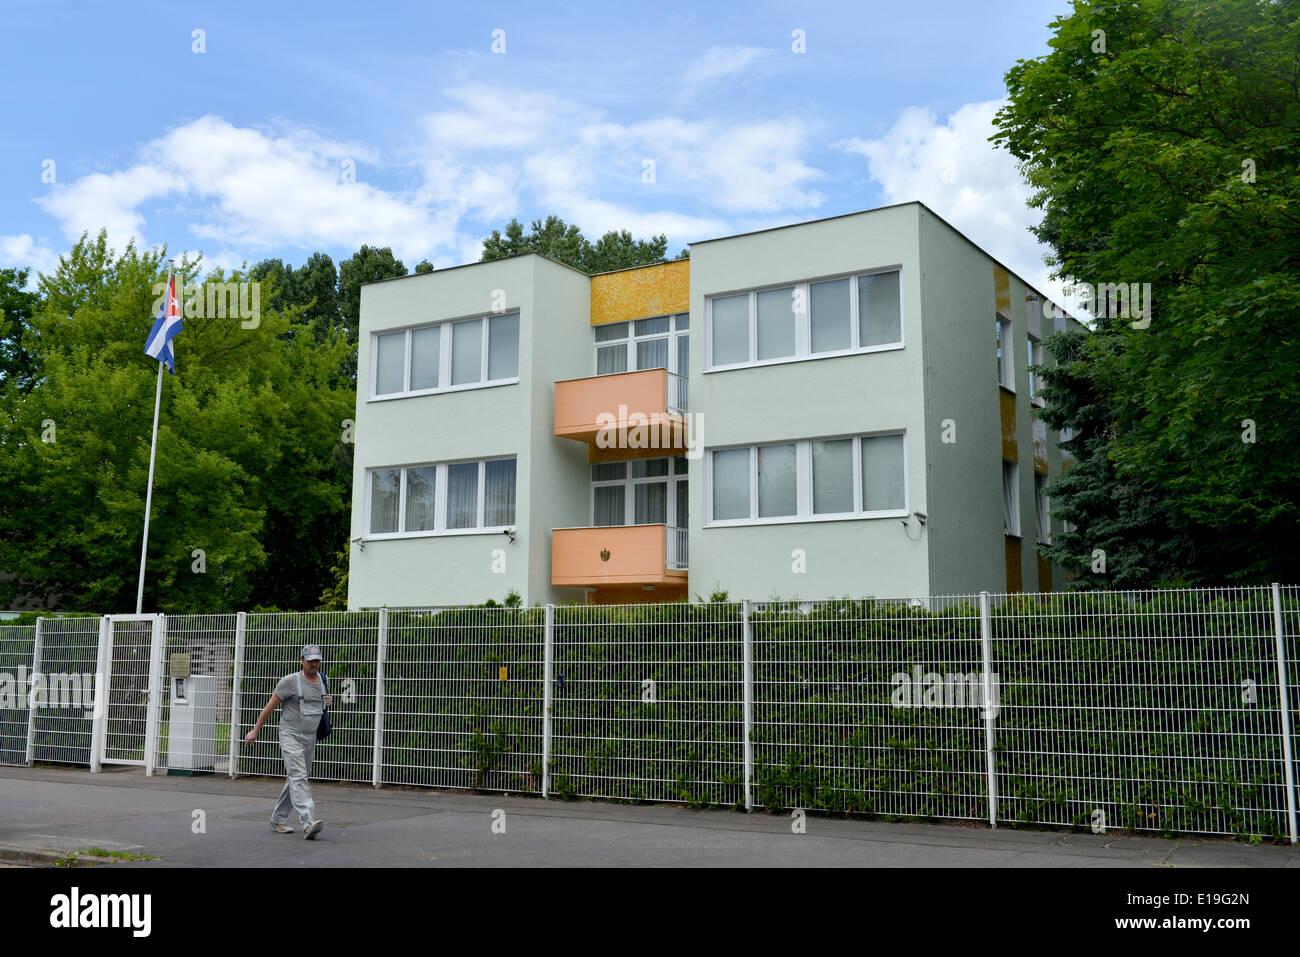 Residenz des Botschafters Republik Kuba, Ibsenstrasse, Pankow, Berlin, Deutschland Stockbild